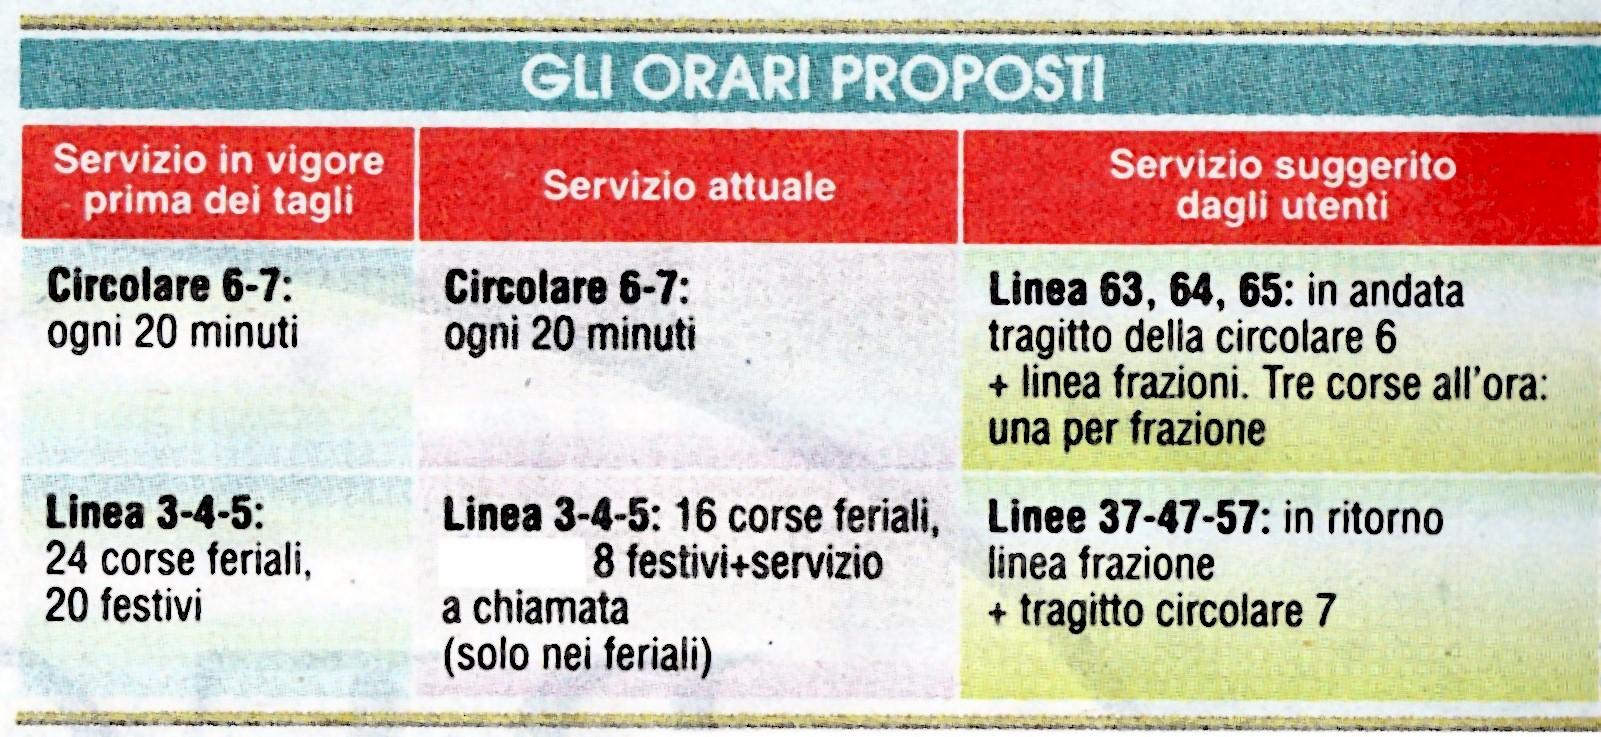 tabella_accorpamento_Nuova_Venezia_14_gen_2011_3.jpg